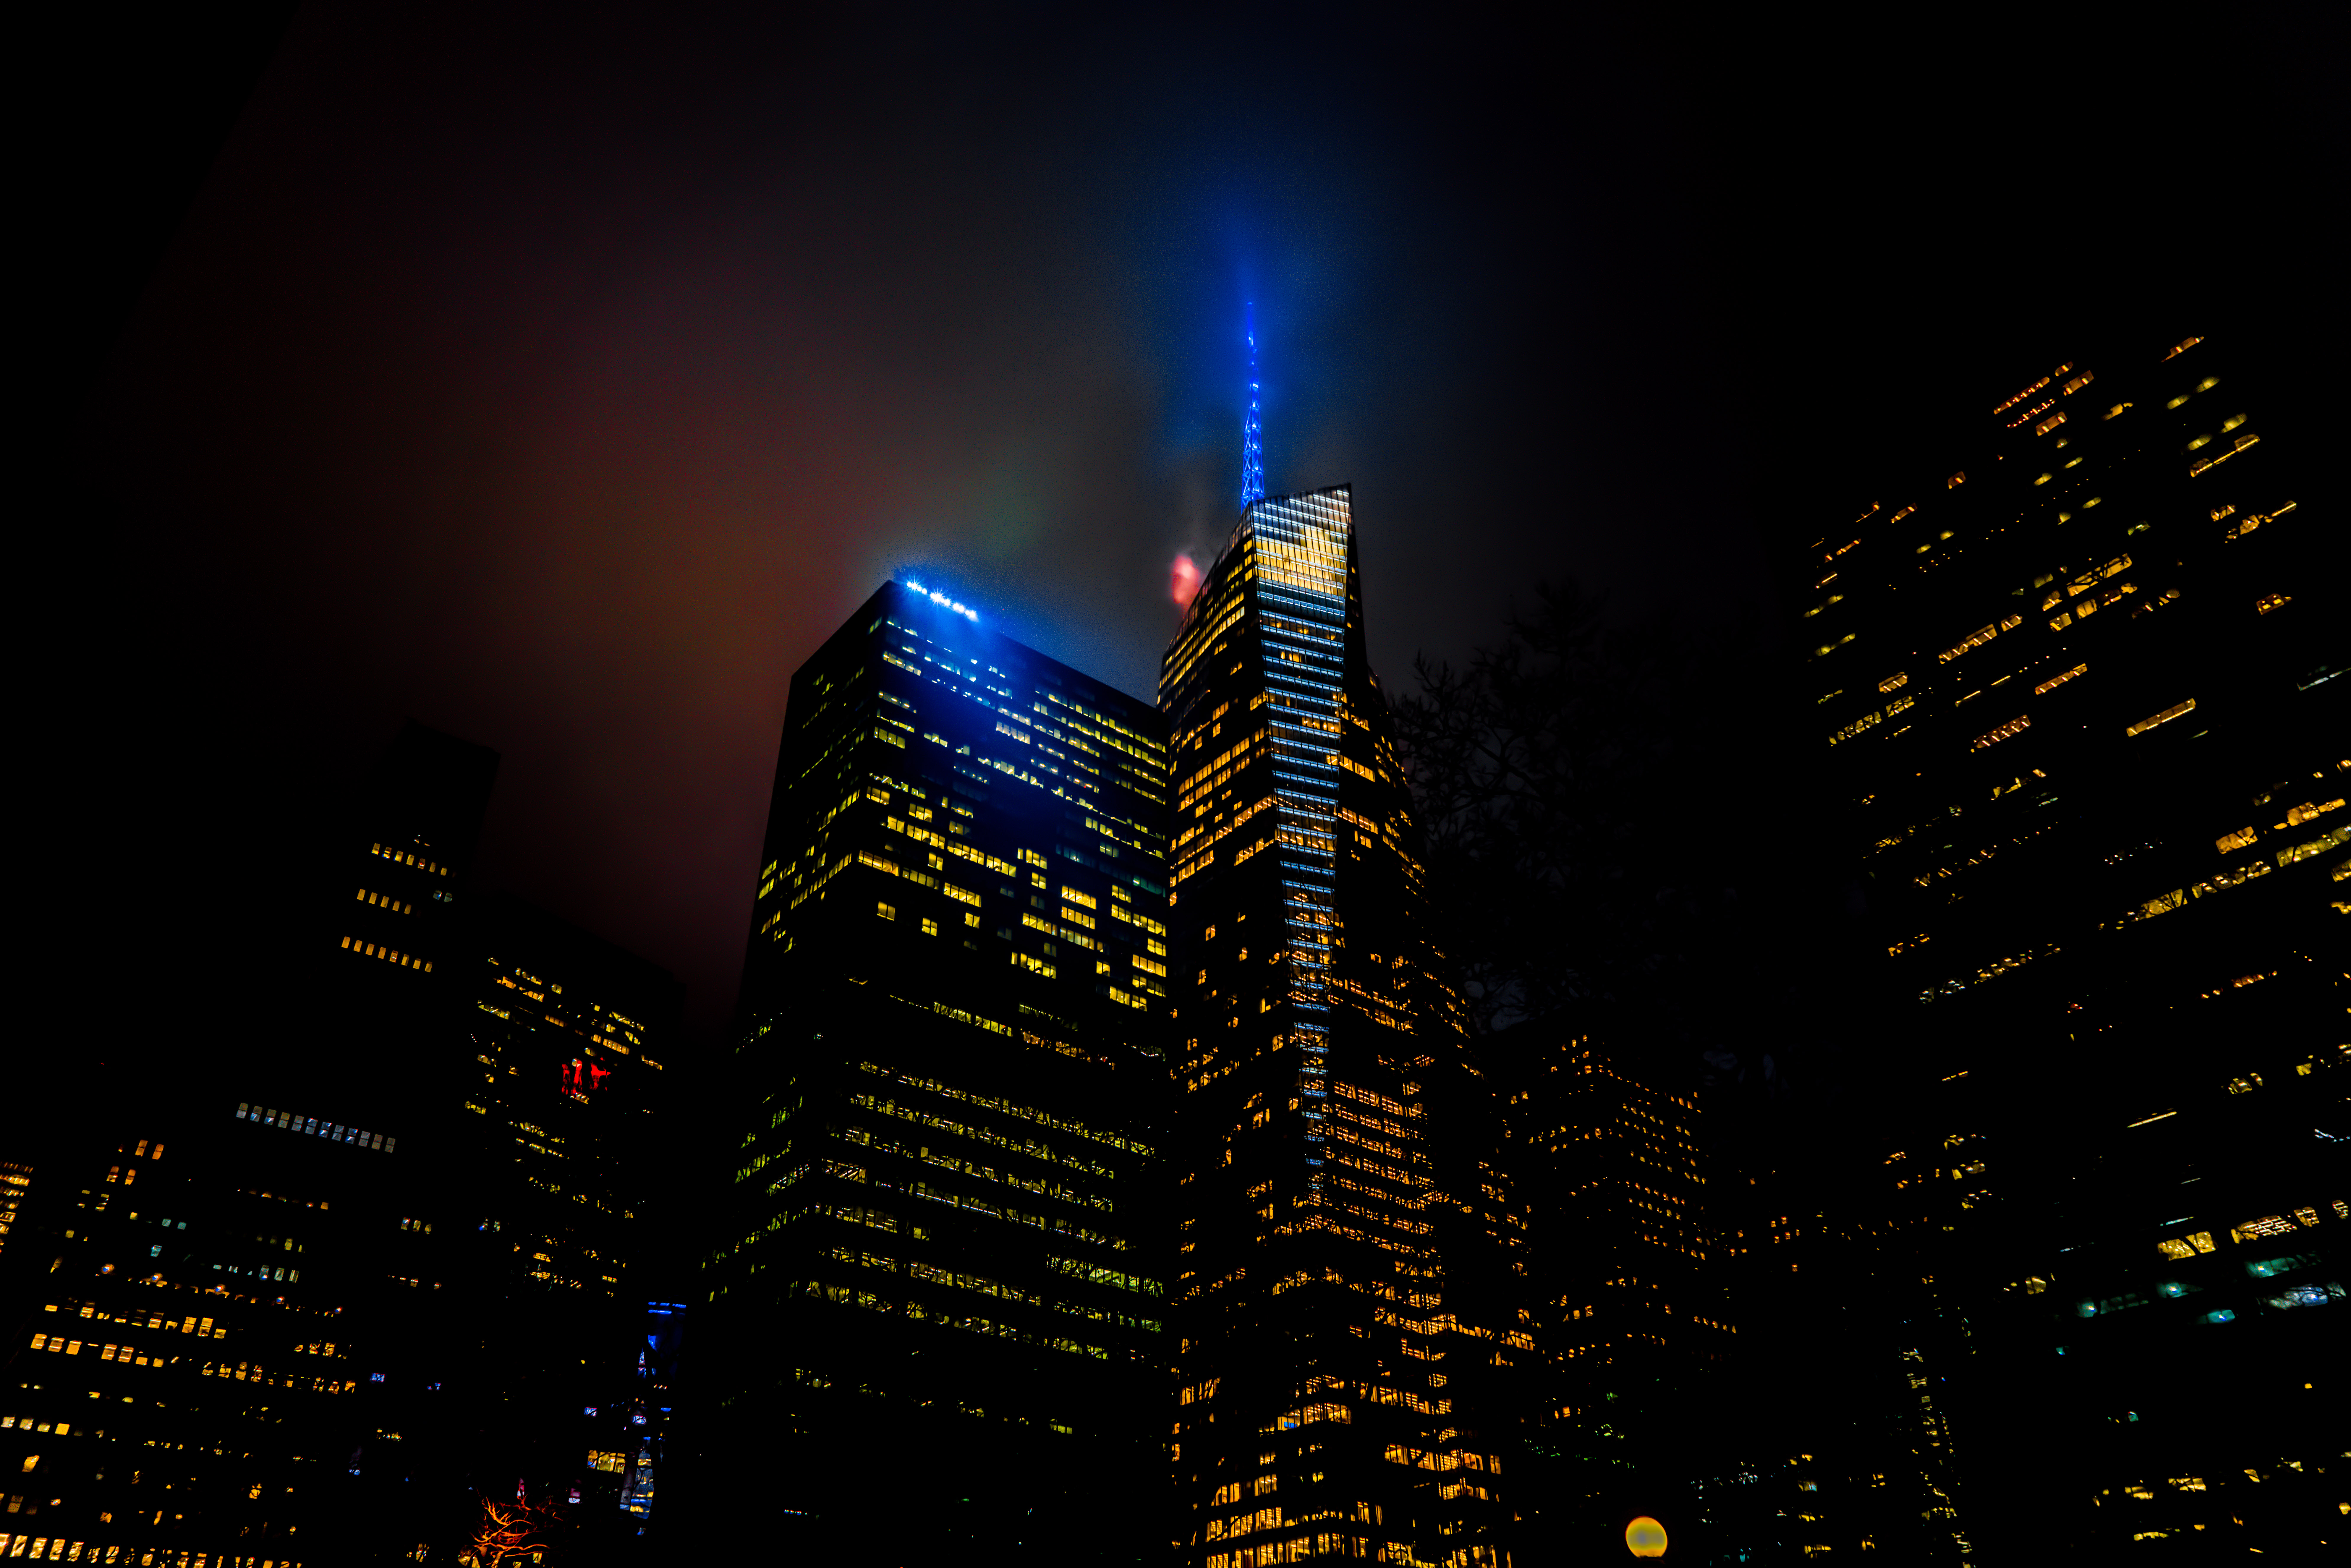 Night Beacon